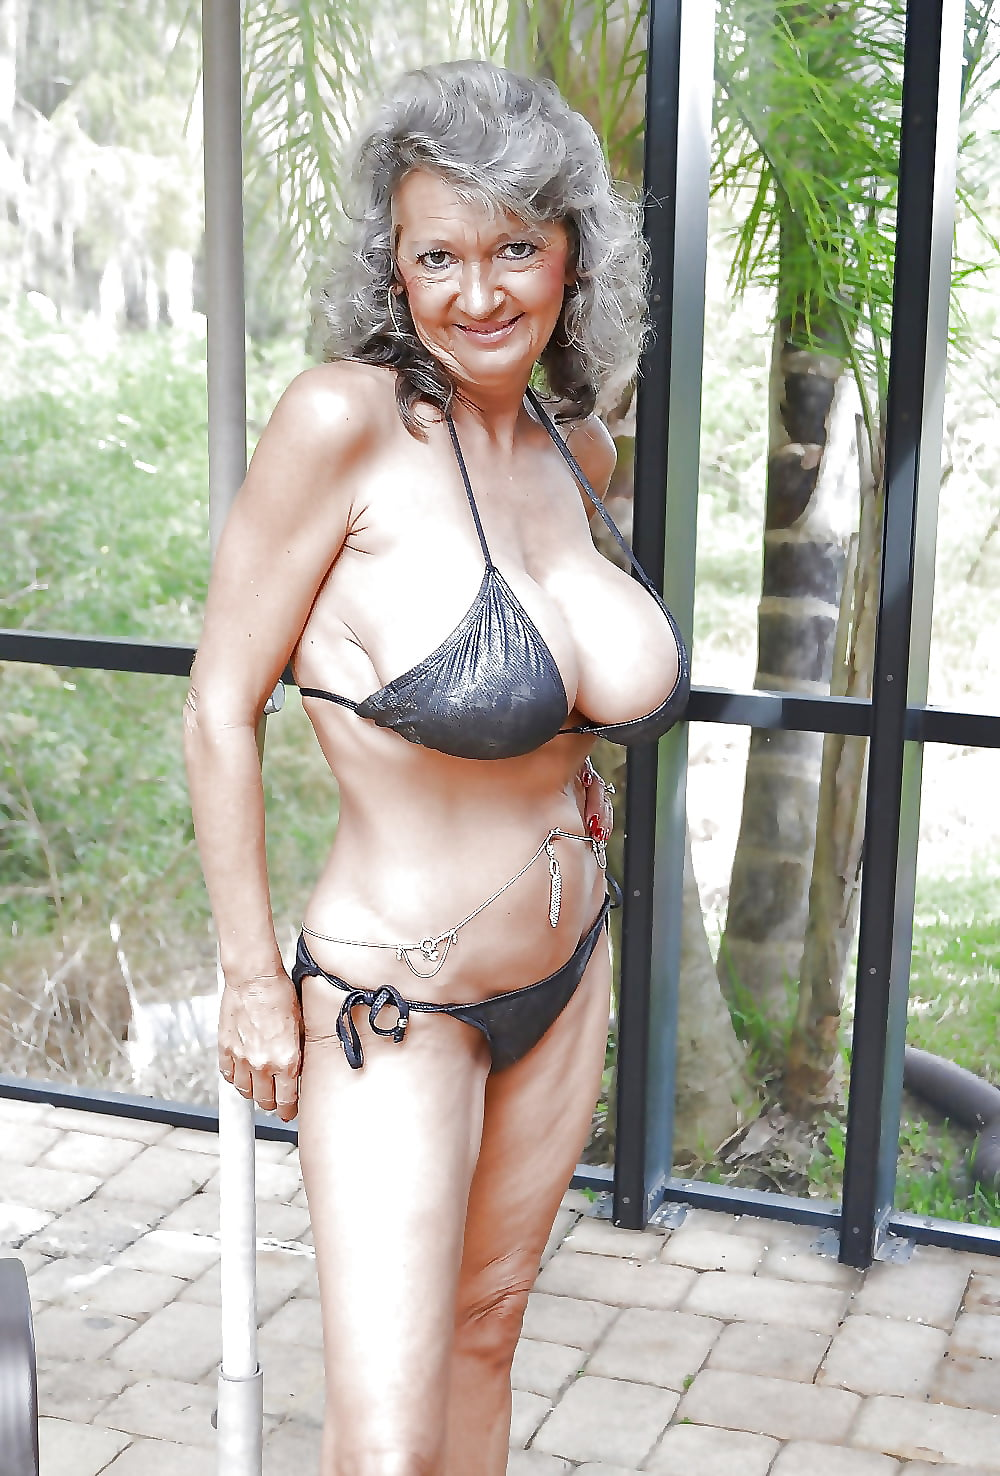 Pin on granny hot